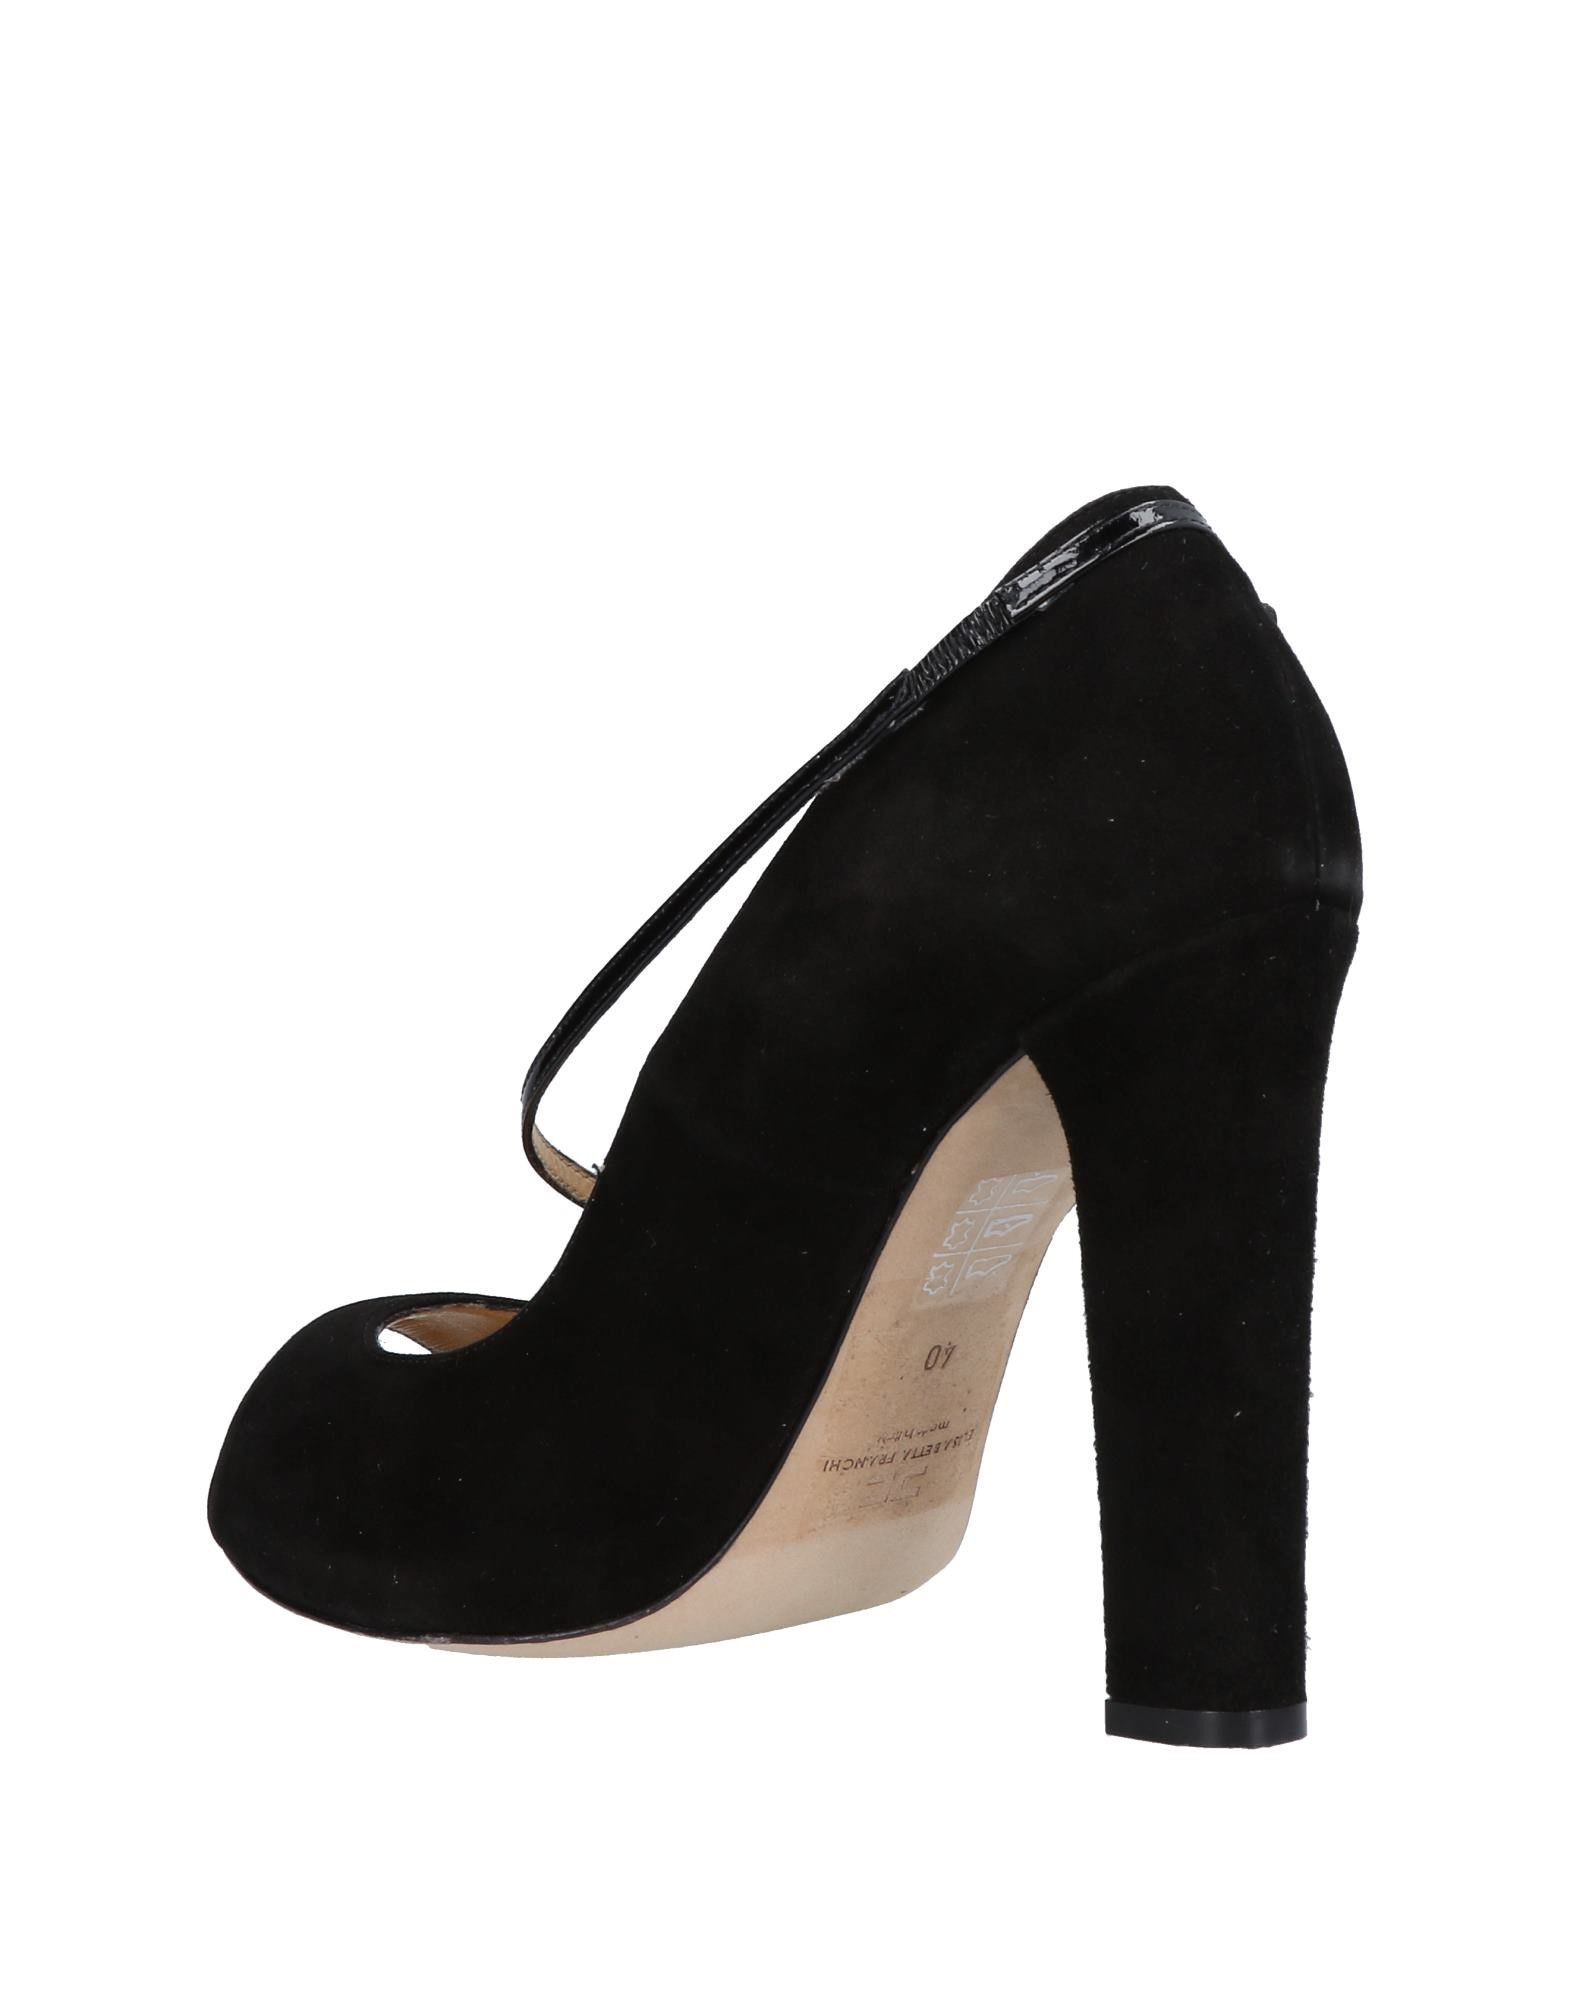 Stilvolle billige Pumps Schuhe Elisabetta Franchi Pumps billige Damen  11244384PE 588441